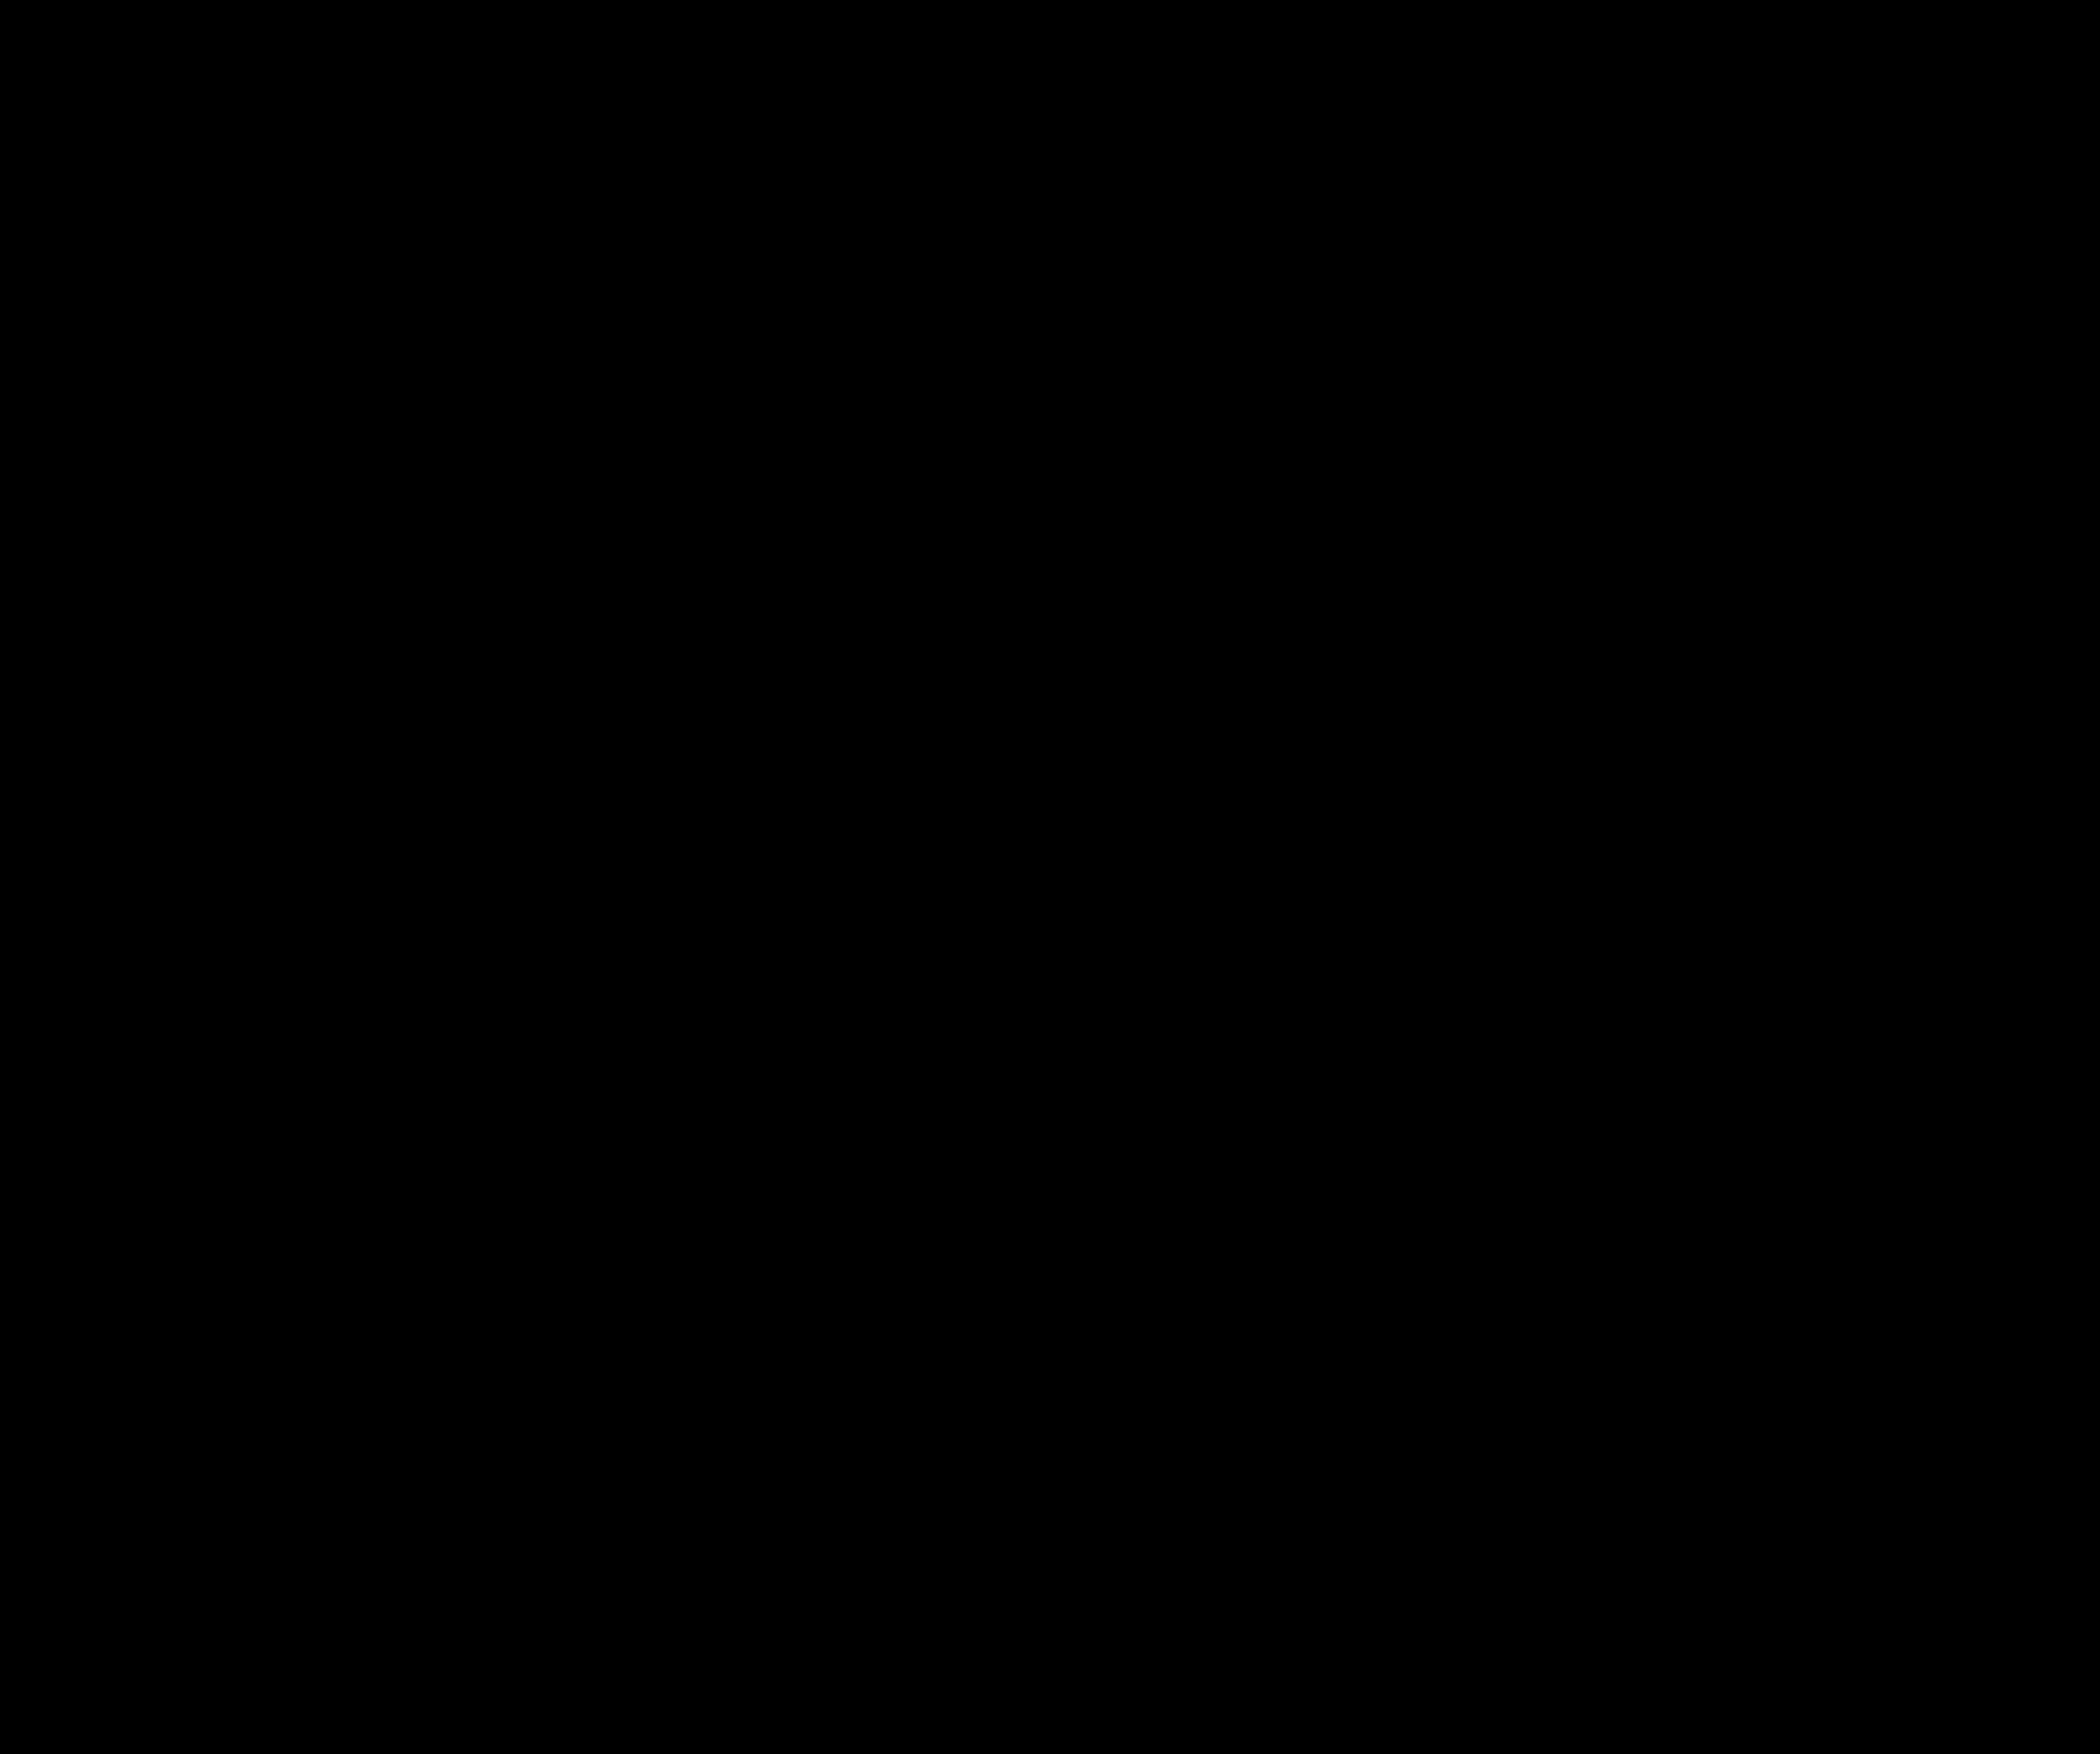 Egyptian cross clipart clip art black and white download Eye of Ra Ankh - Ojo de Ra Ankh Icons PNG - Free PNG and Icons Downloads clip art black and white download